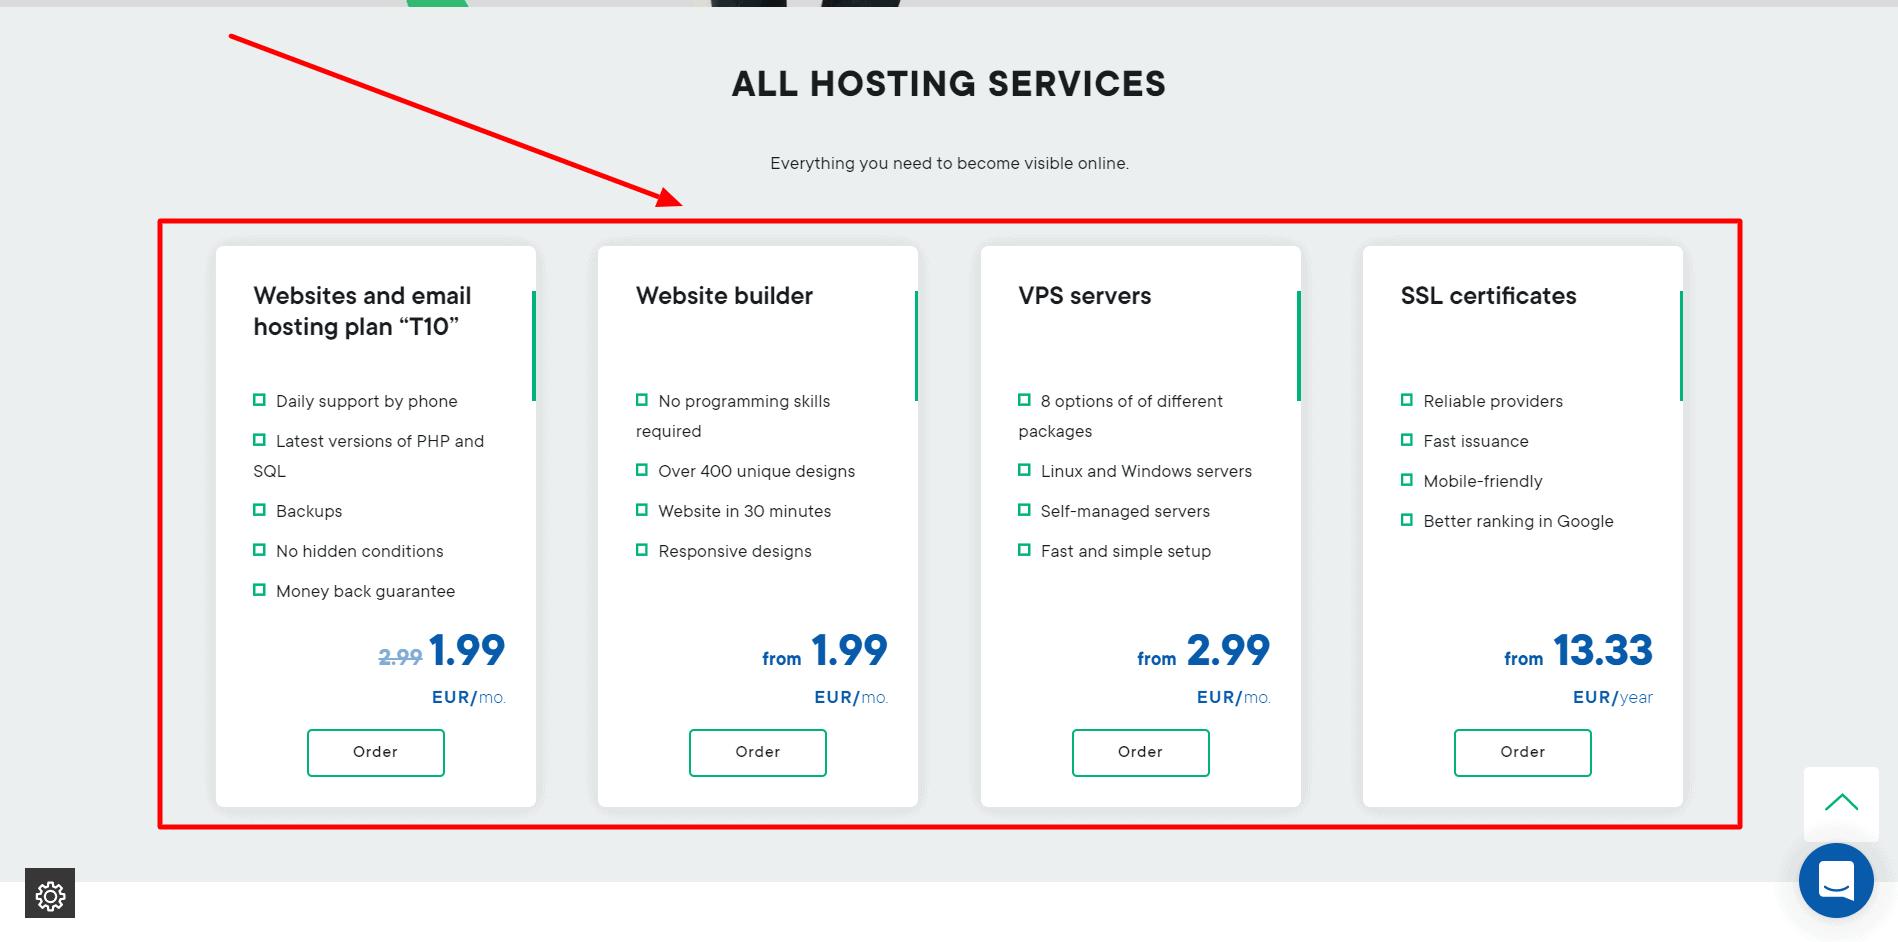 Interneto vizija Pricing